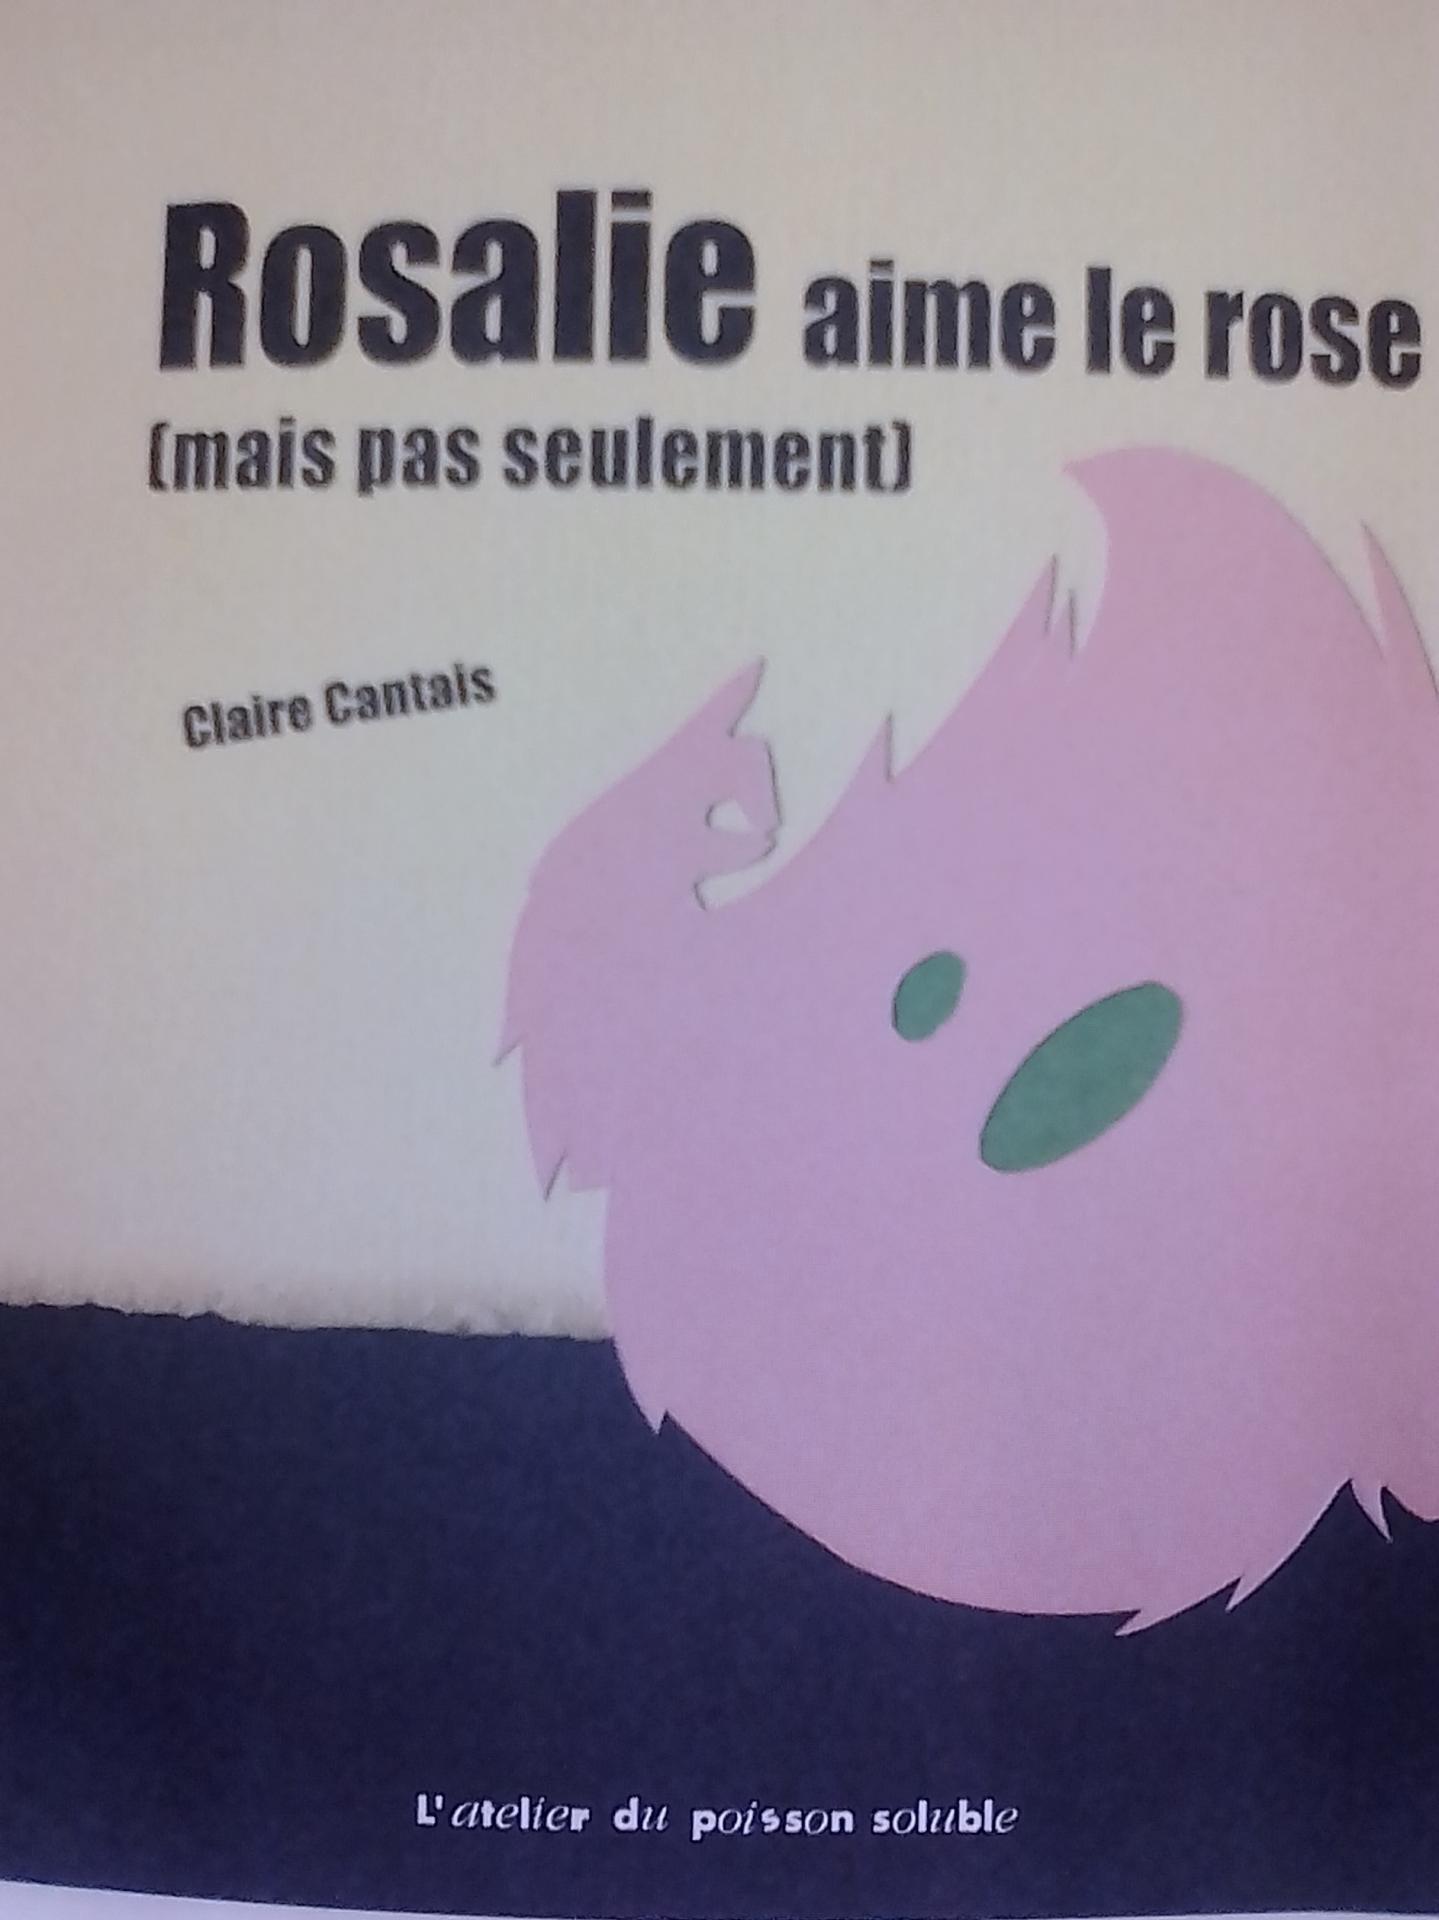 Rosalie aime le rose